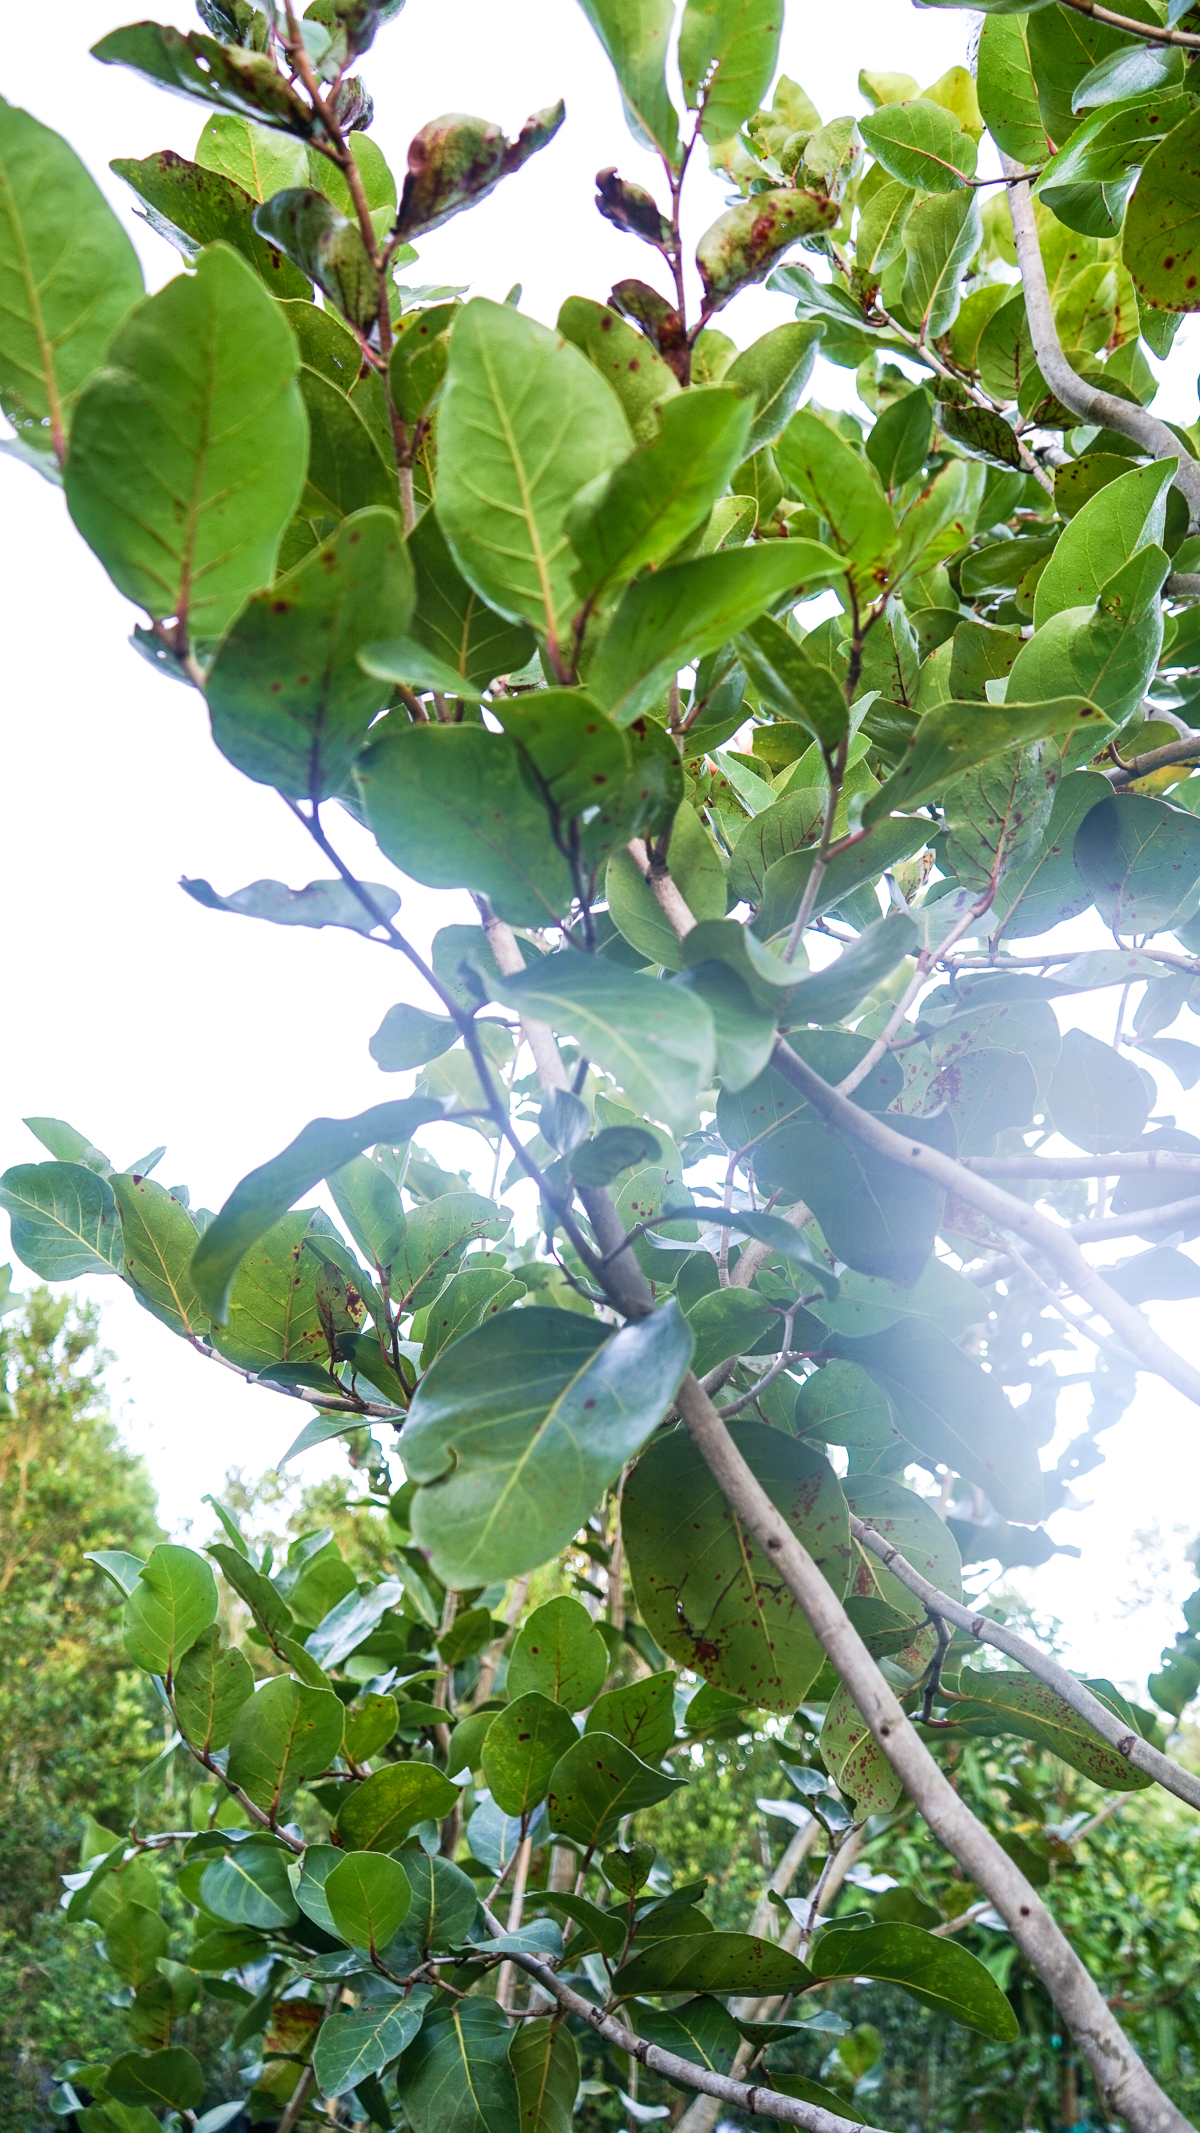 Plant Creations Nursery Sea Plum coccoloba uvifera x diversifolia